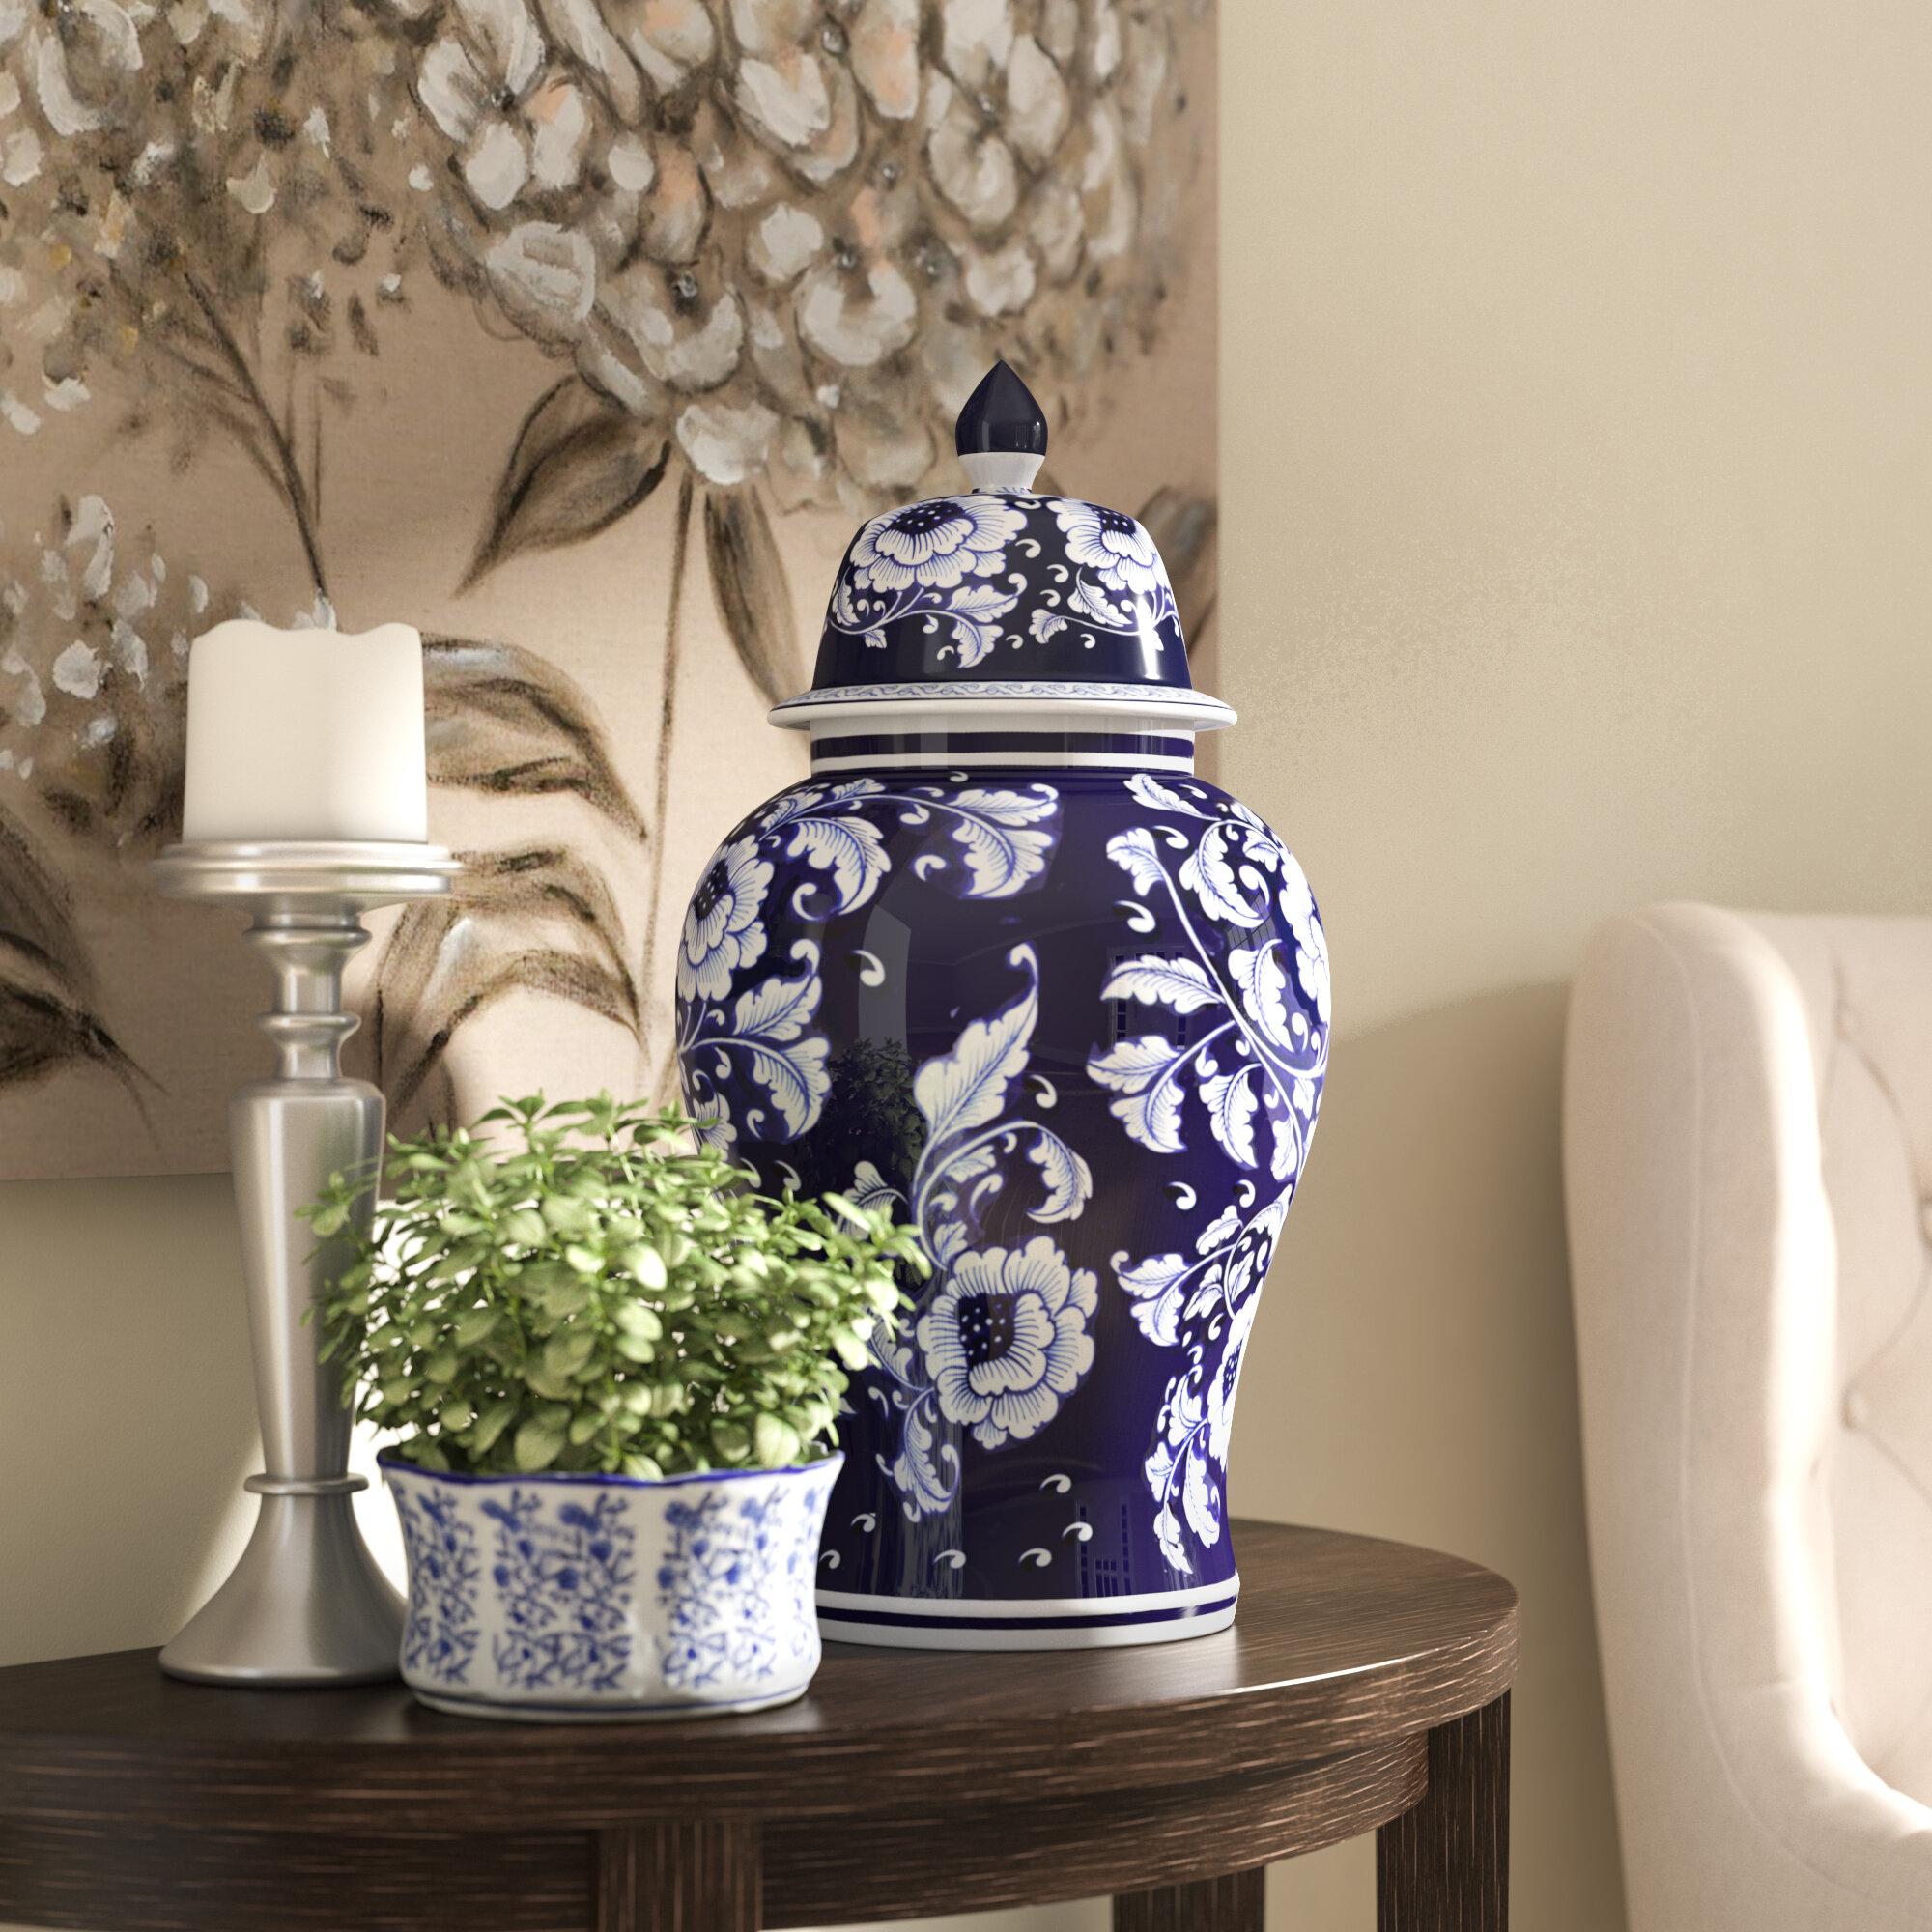 Alcott Hill Blue And White Ceramic Decorative Urn